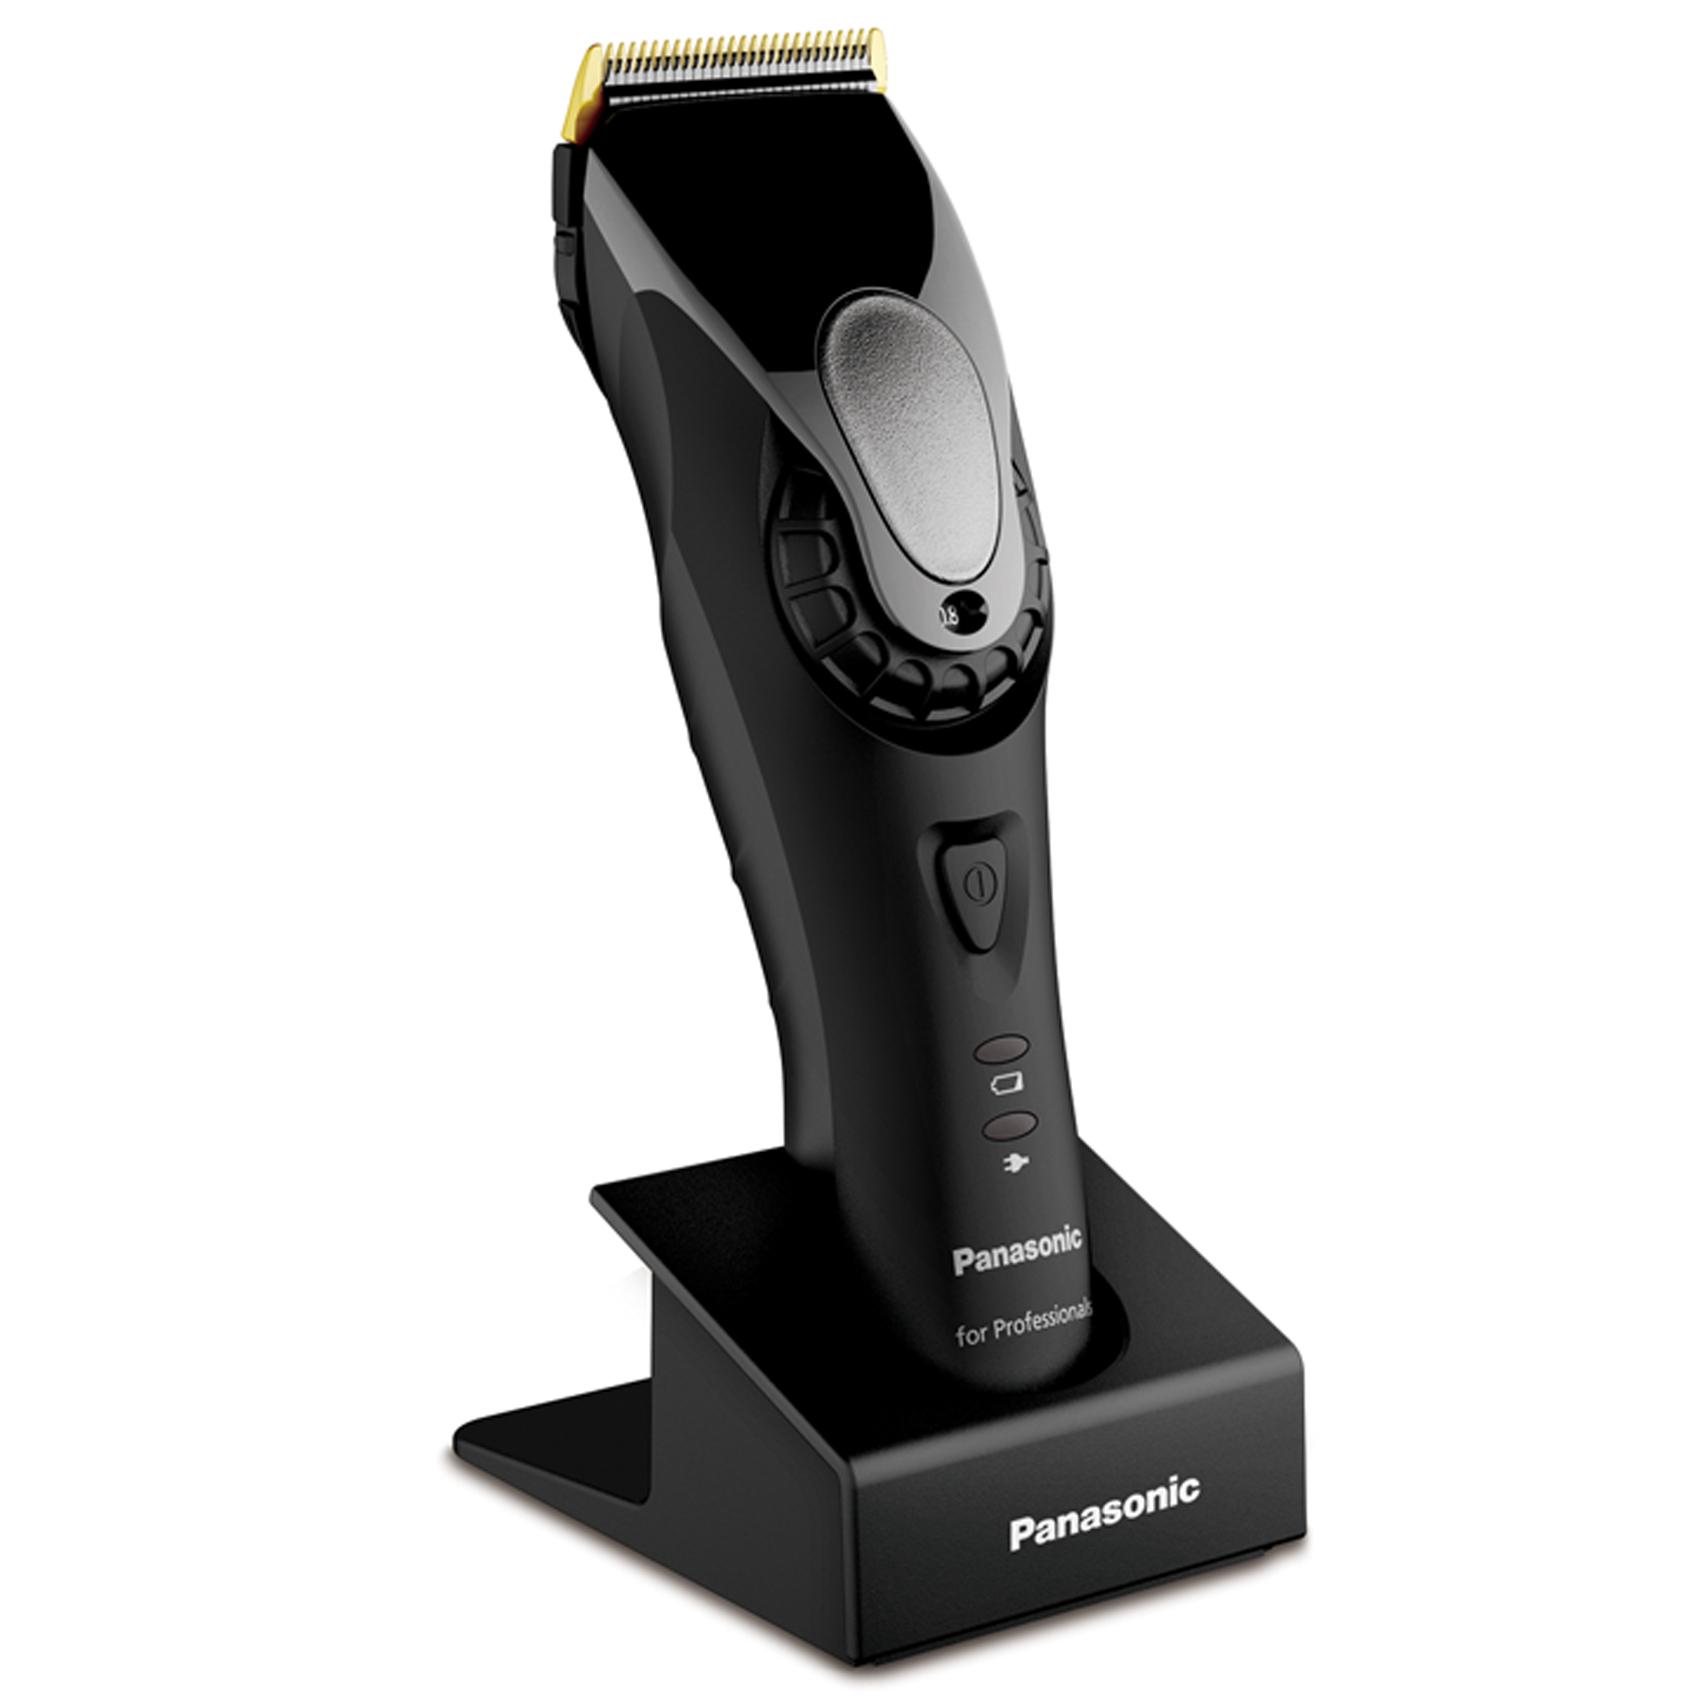 PANASONIC H-CLIPPER ERGP80